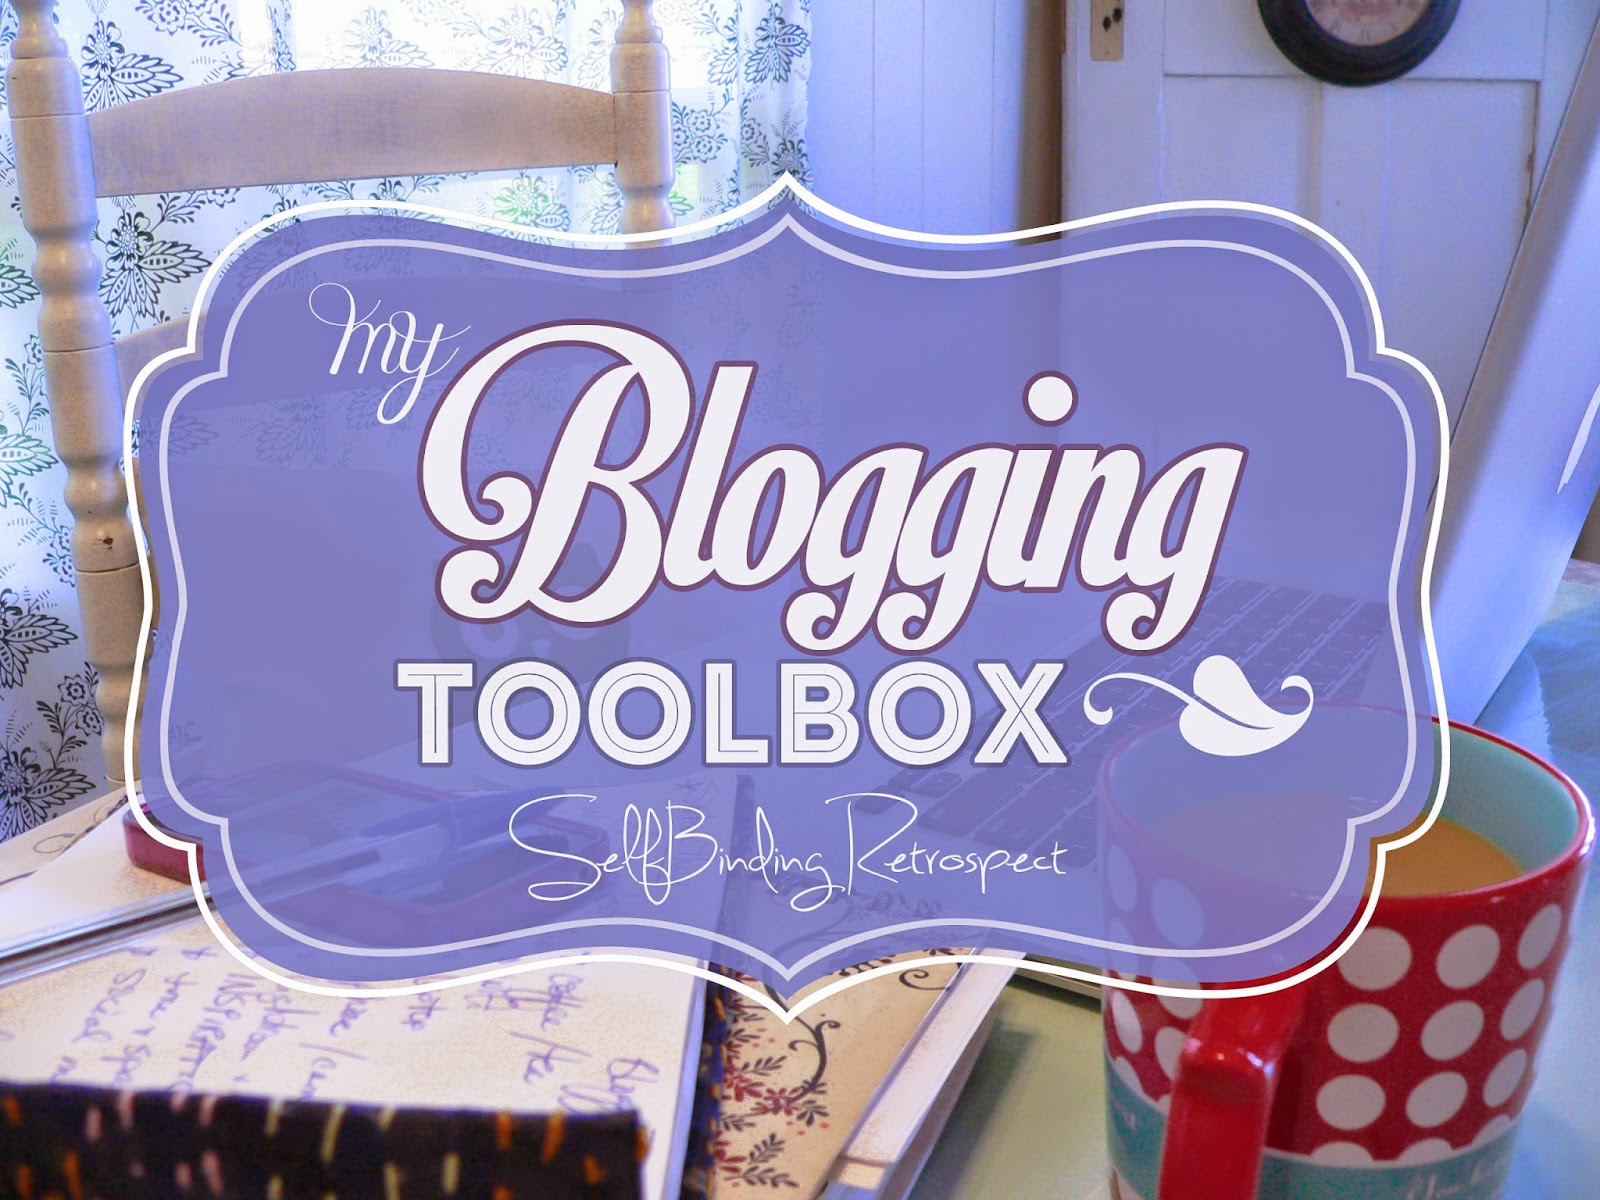 My Blogging Tool Box - SelfBinding Retrospect by Alanna Rusnak